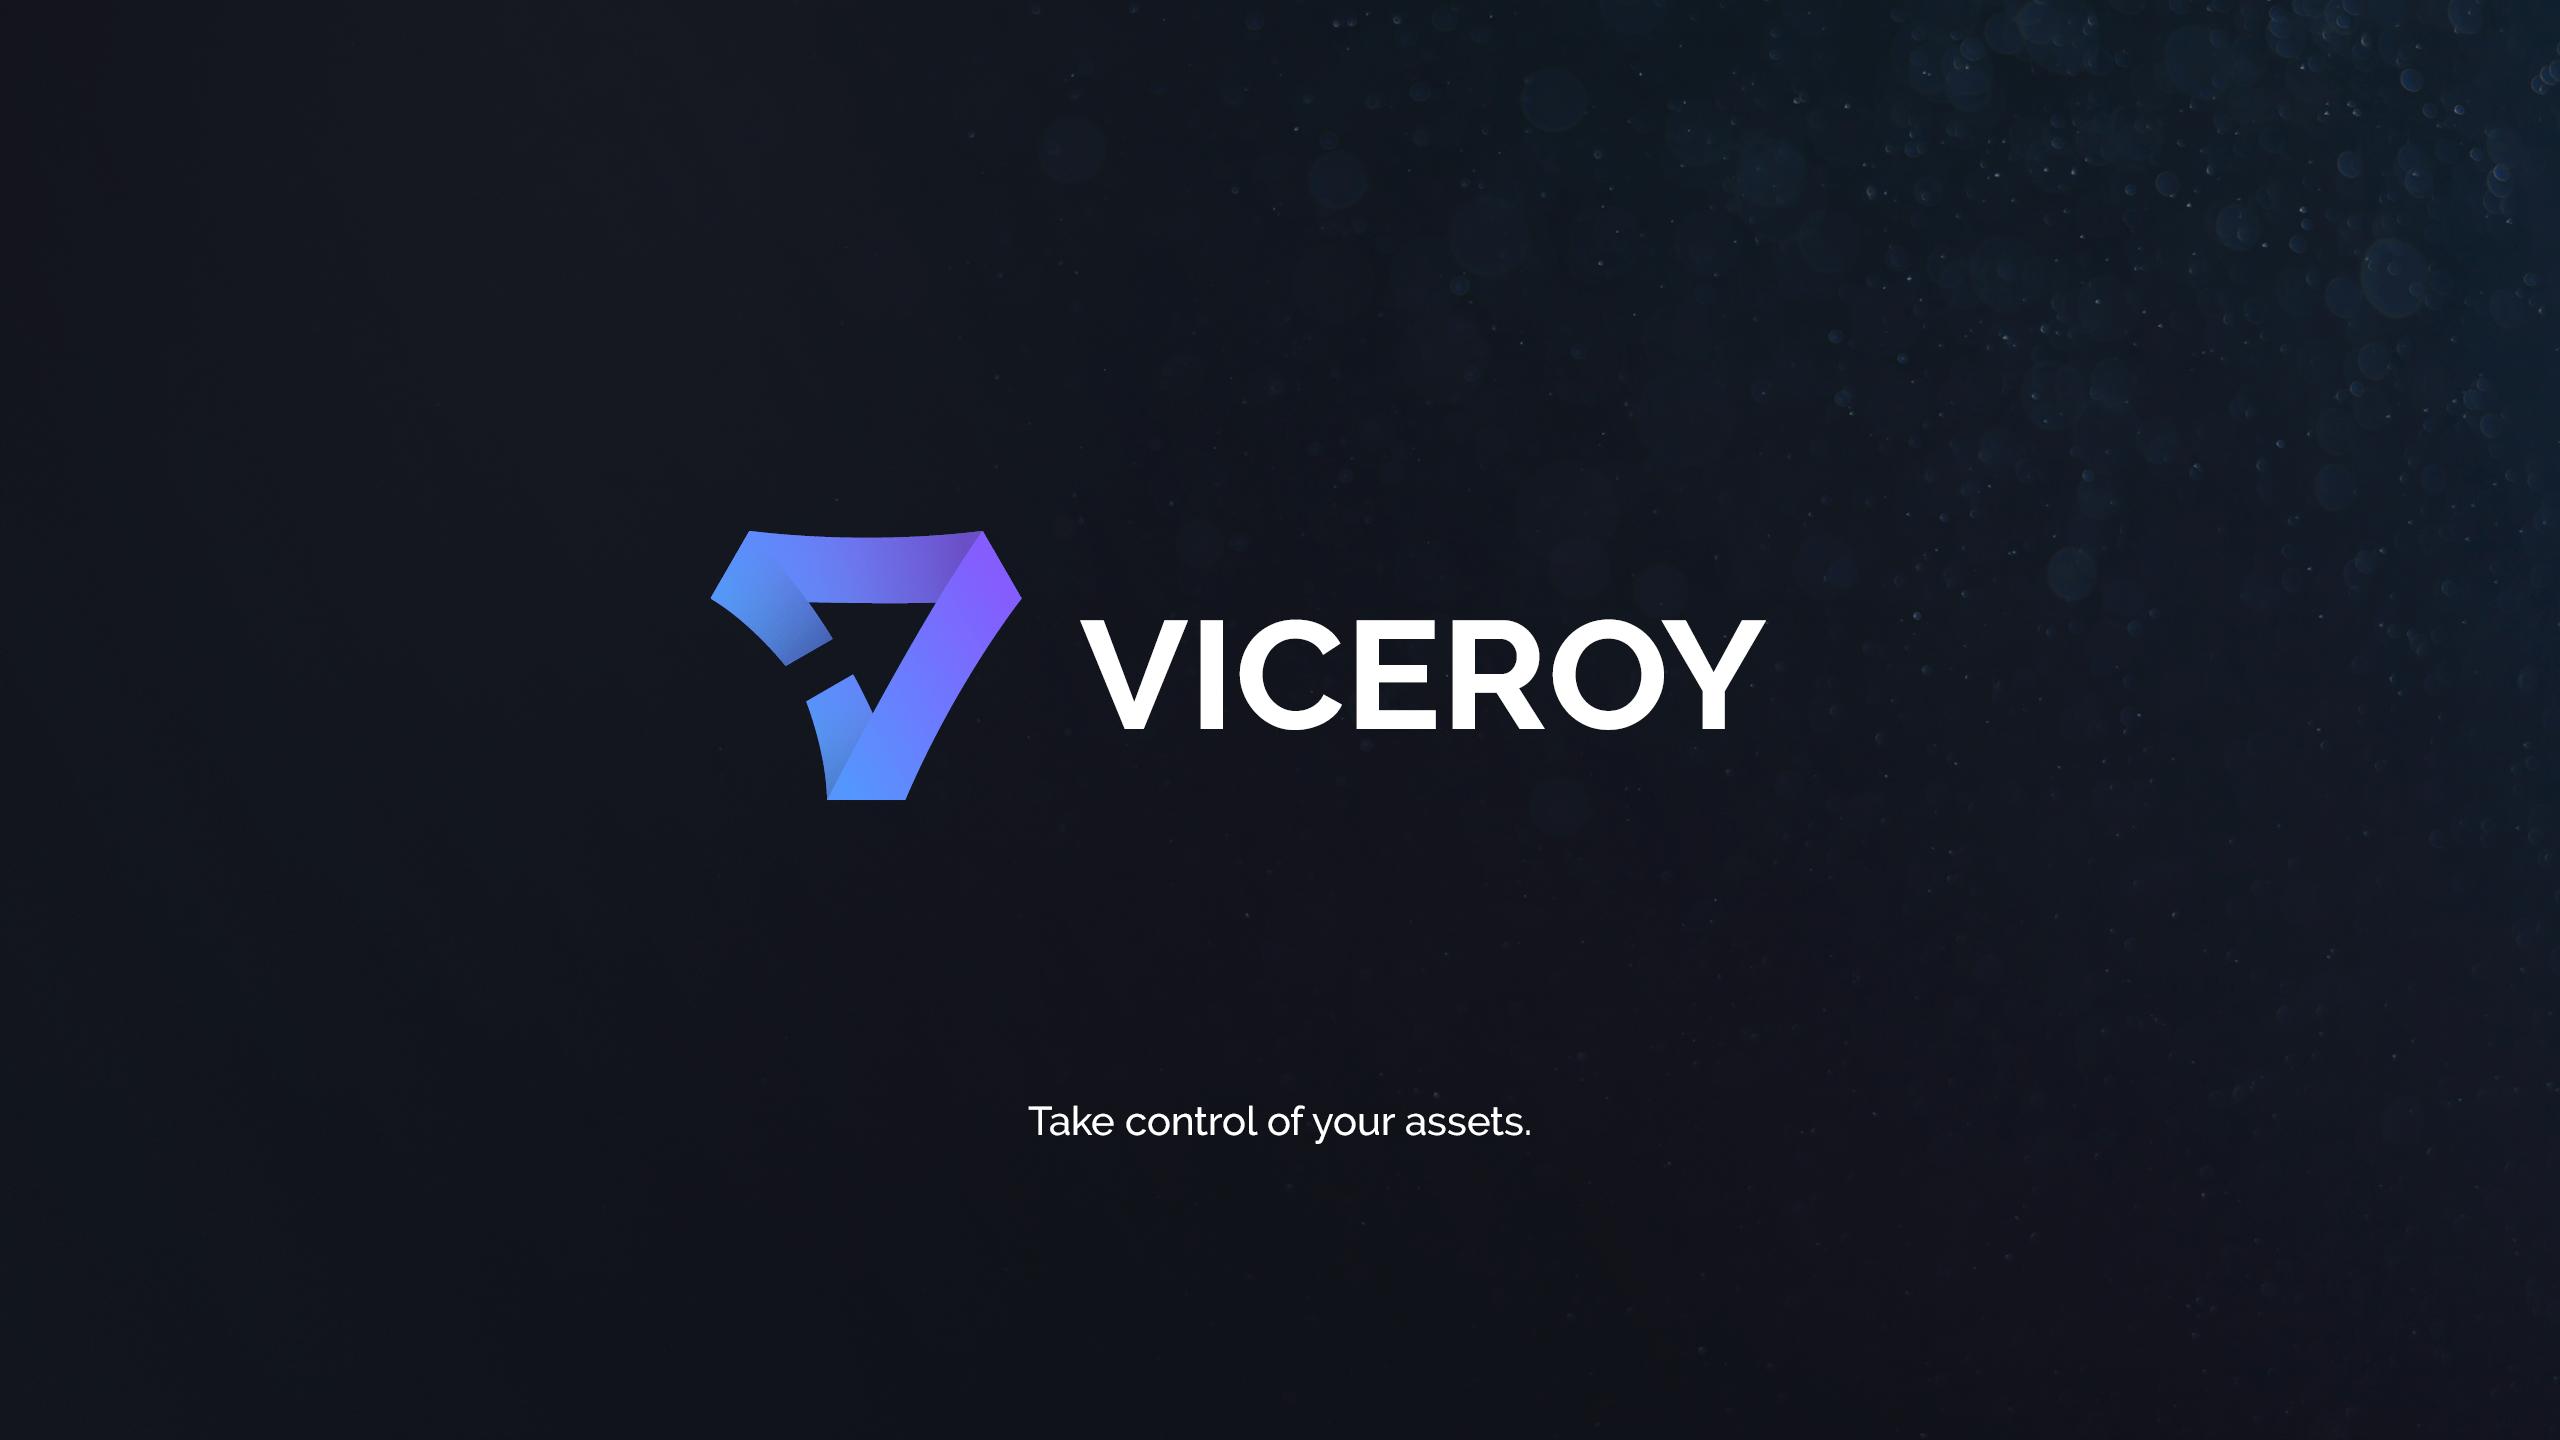 Viceroy - logo